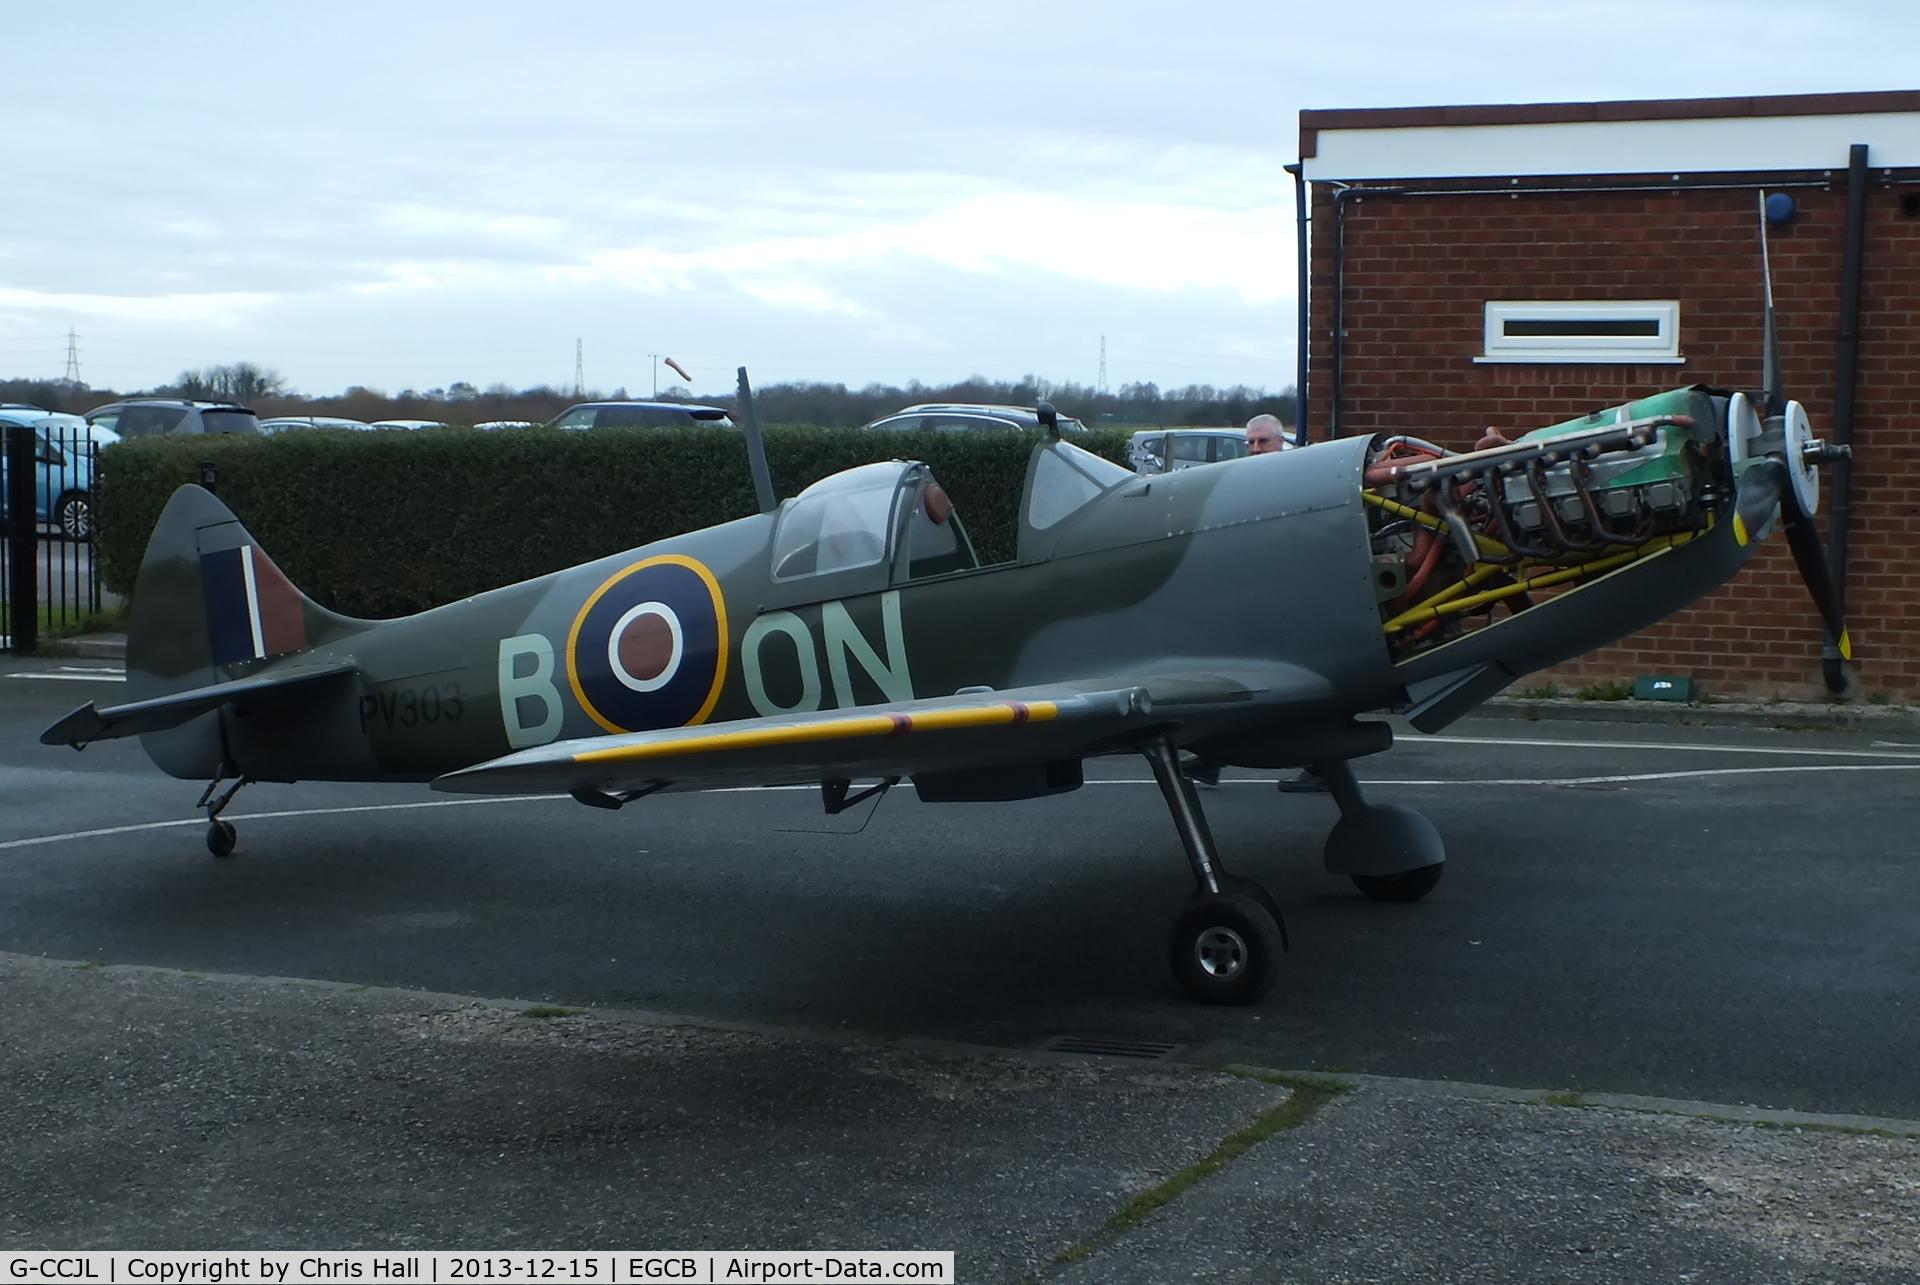 G-CCJL, 2007 Supermarine Aircraft Spitfire Mk.26 C/N PFA 324-14053, Supermarine Aircraft Spitfire Mk26 fitted with a Jabiru 5100 engine